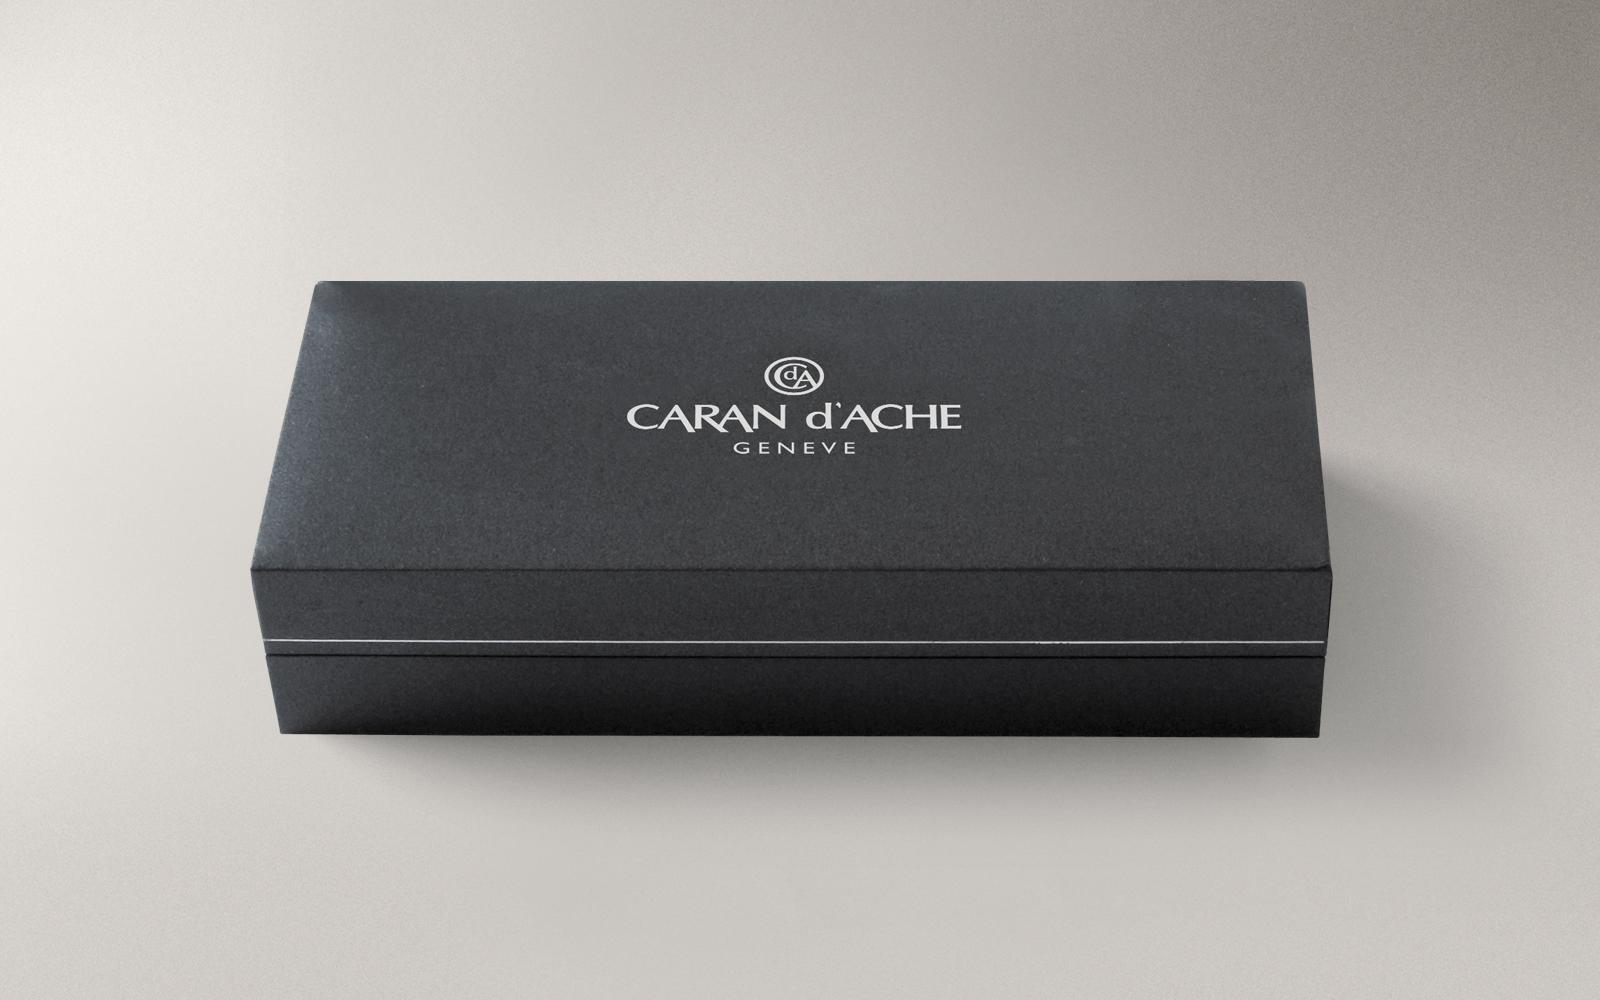 Carandache Ecridor - Mademoiselle PC Padlock Charm, шариковая ручка, F